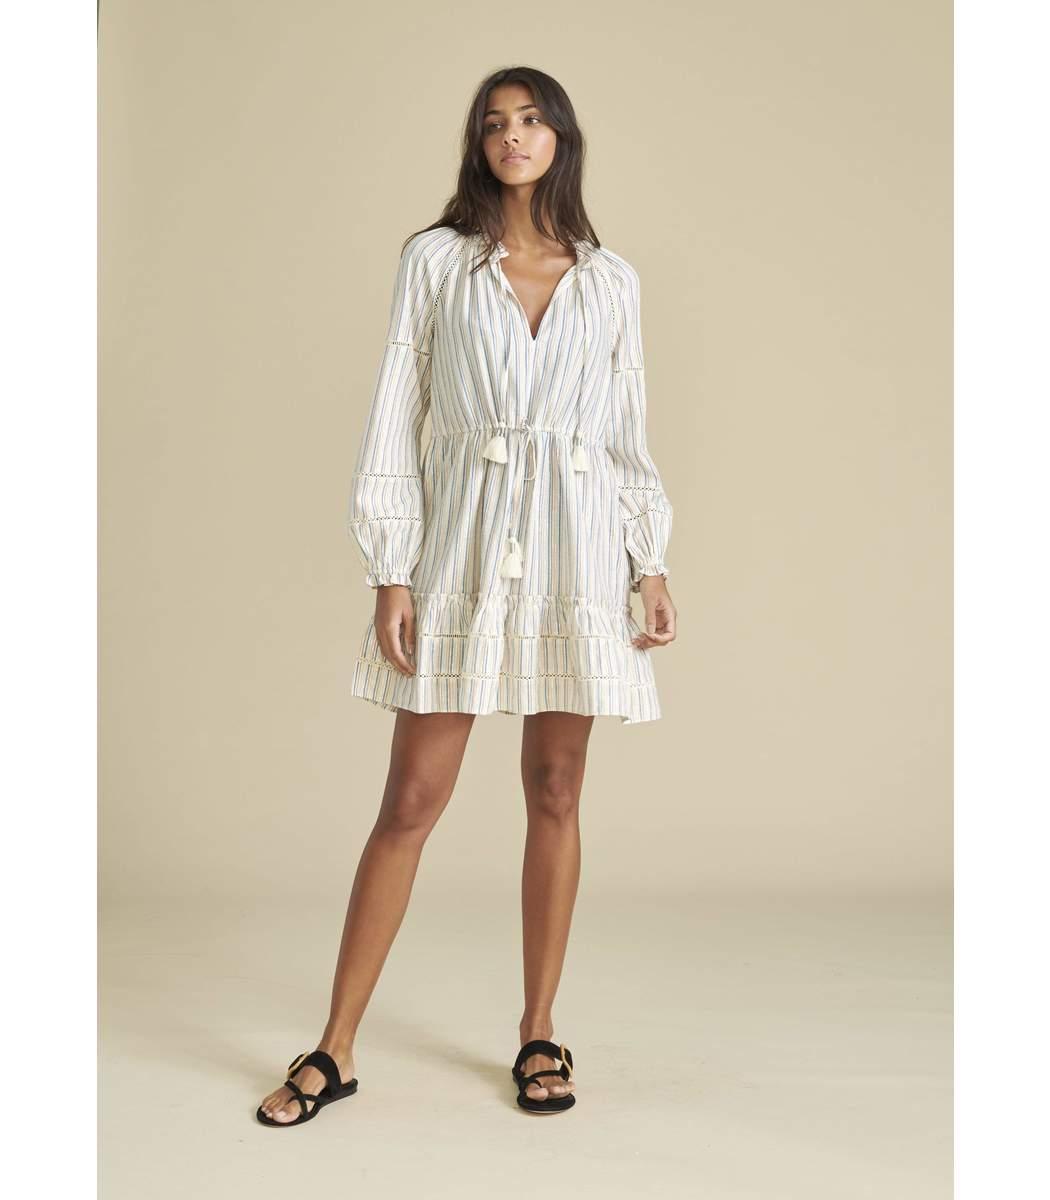 VERONICA BEARD Mini dresses Danica Floral Cover-Up Dress